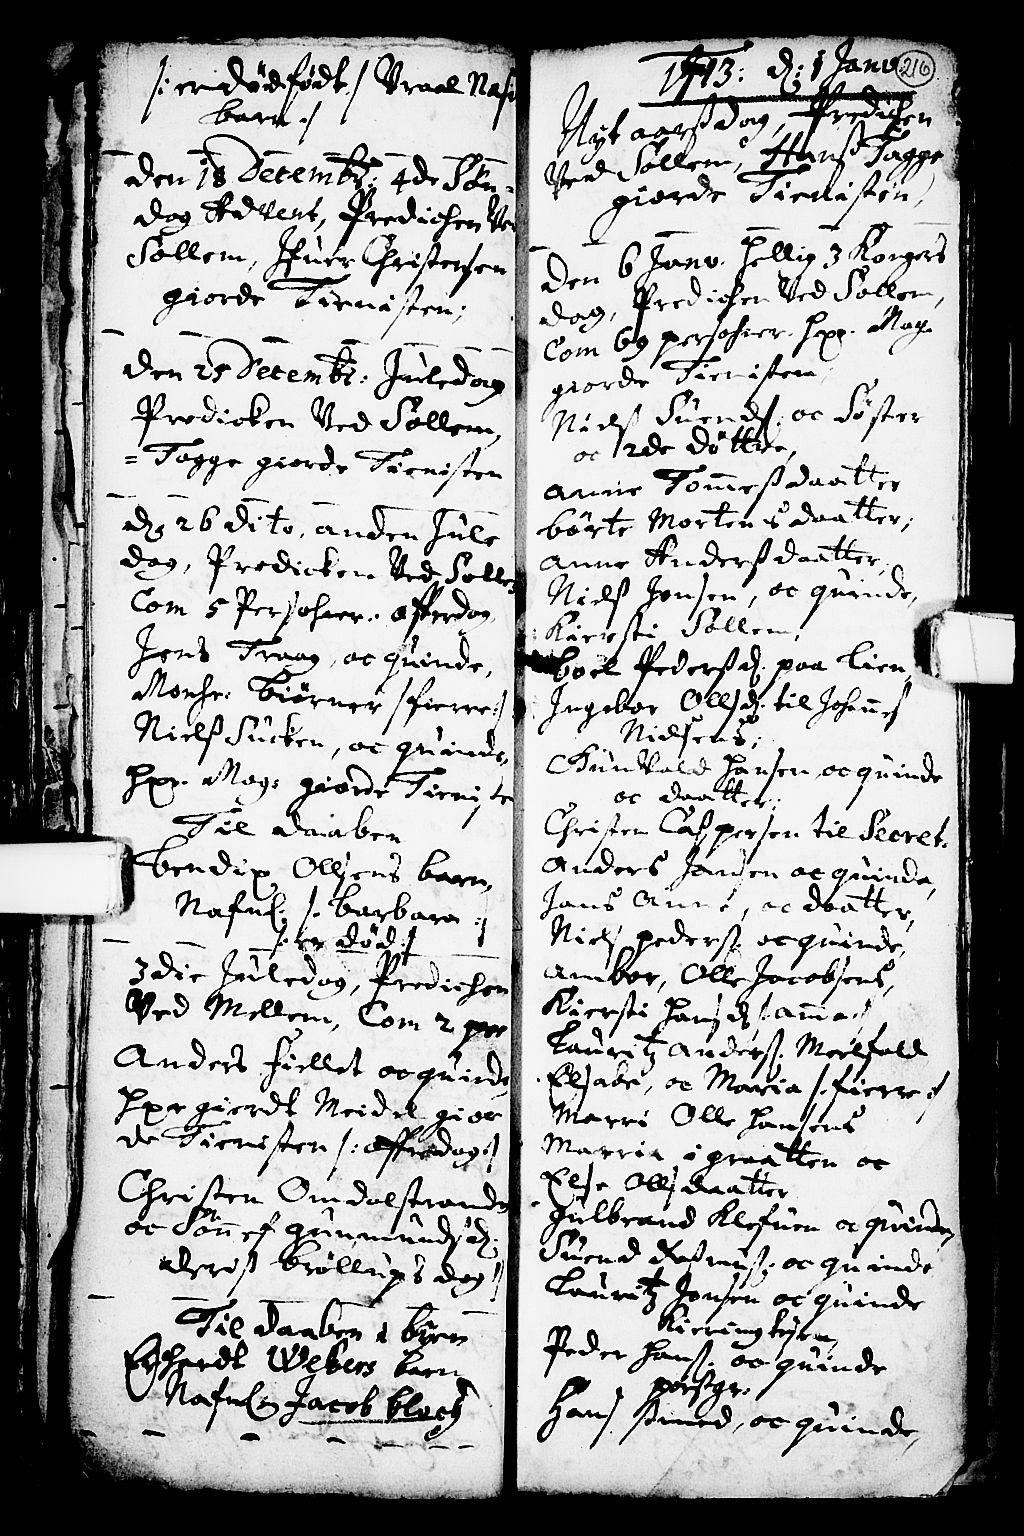 SAKO, Solum kirkebøker, F/Fa/L0001: Ministerialbok nr. I 1, 1701-1716, s. 216